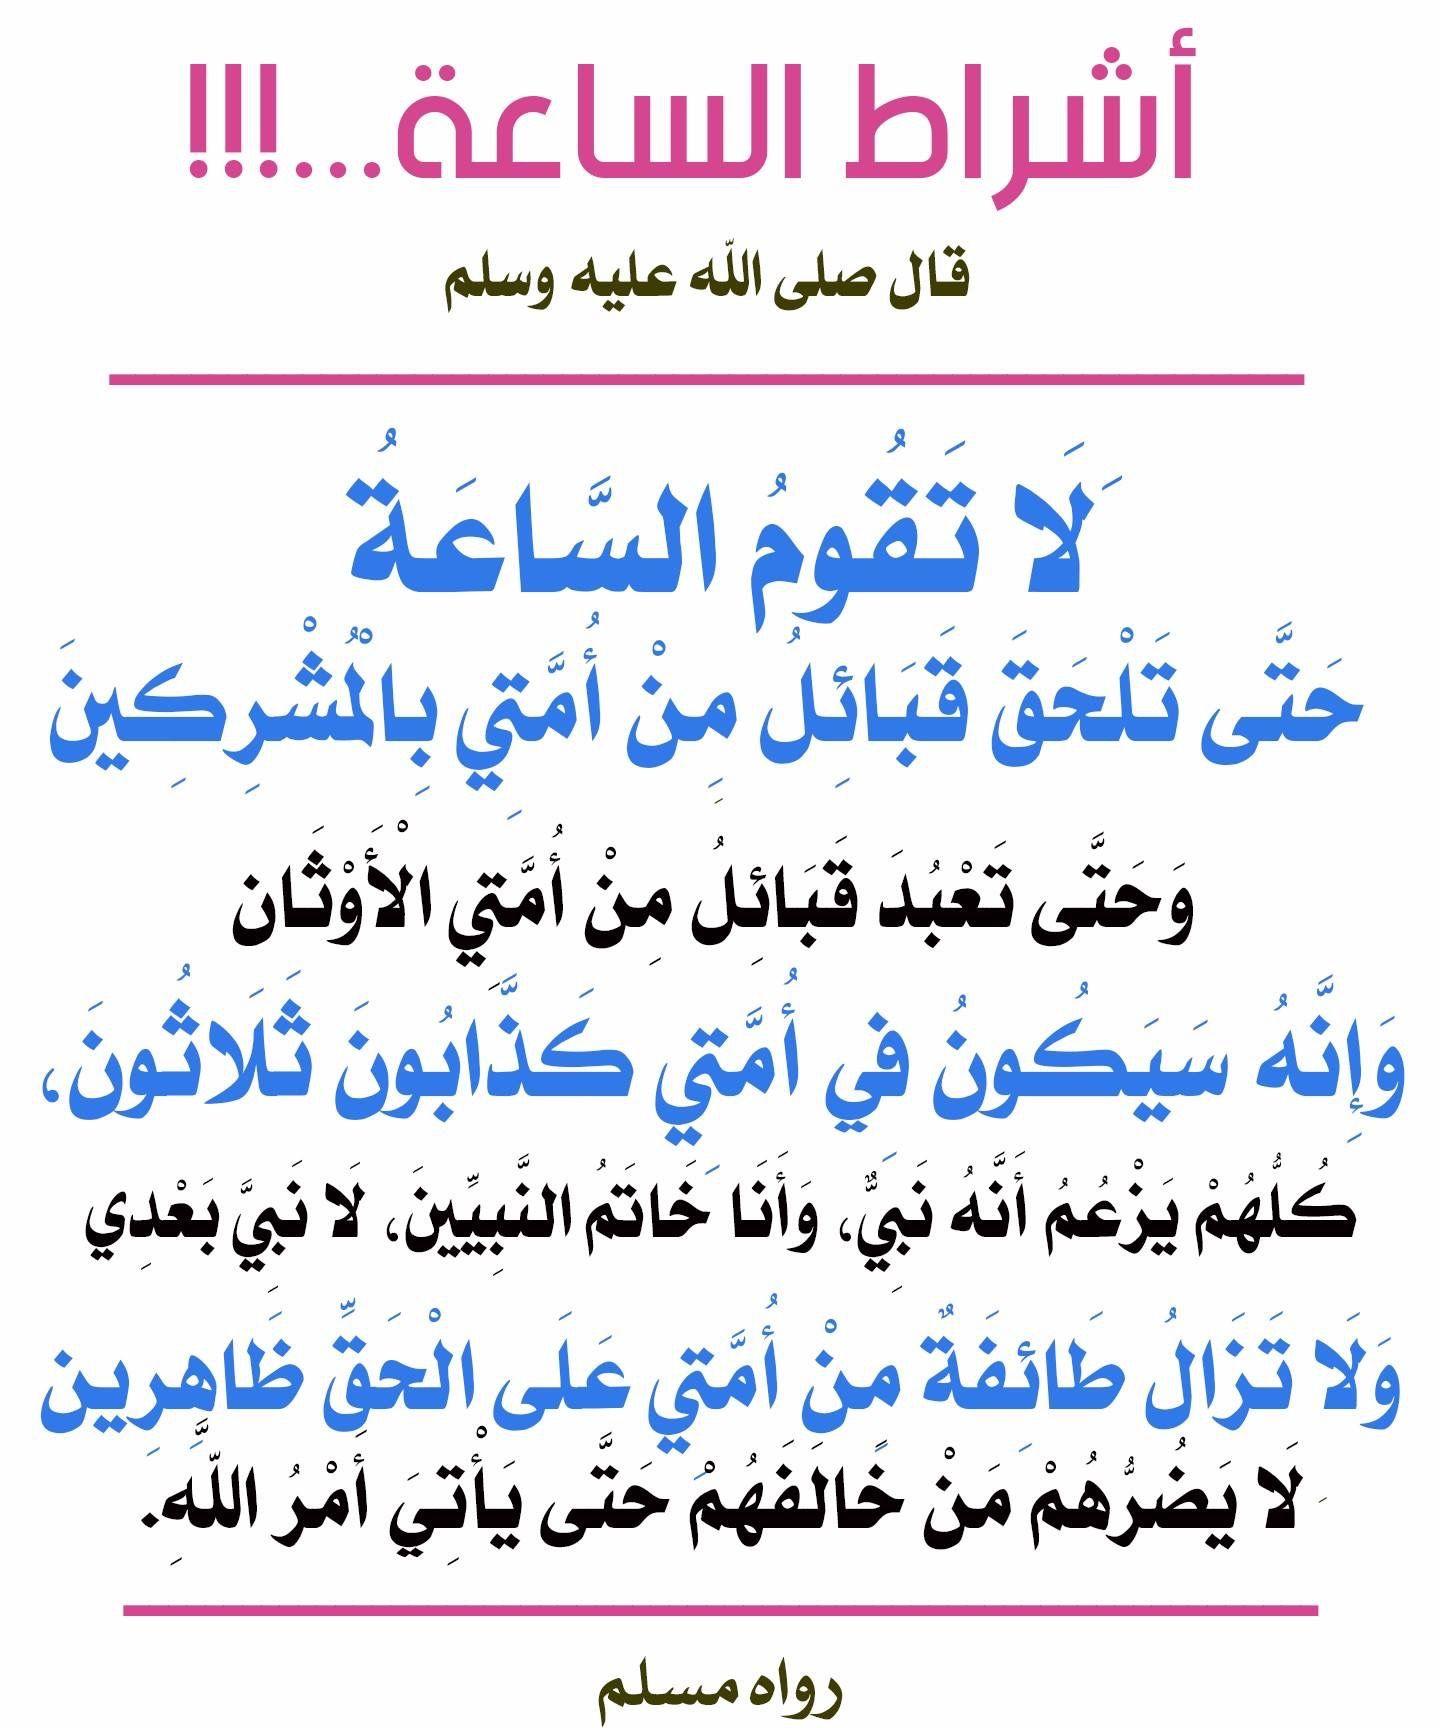 Pin By سوف الجين On أحاديث البخاري ومسلم Islamic Phrases Islamic Quotes Islamic Quotes Quran